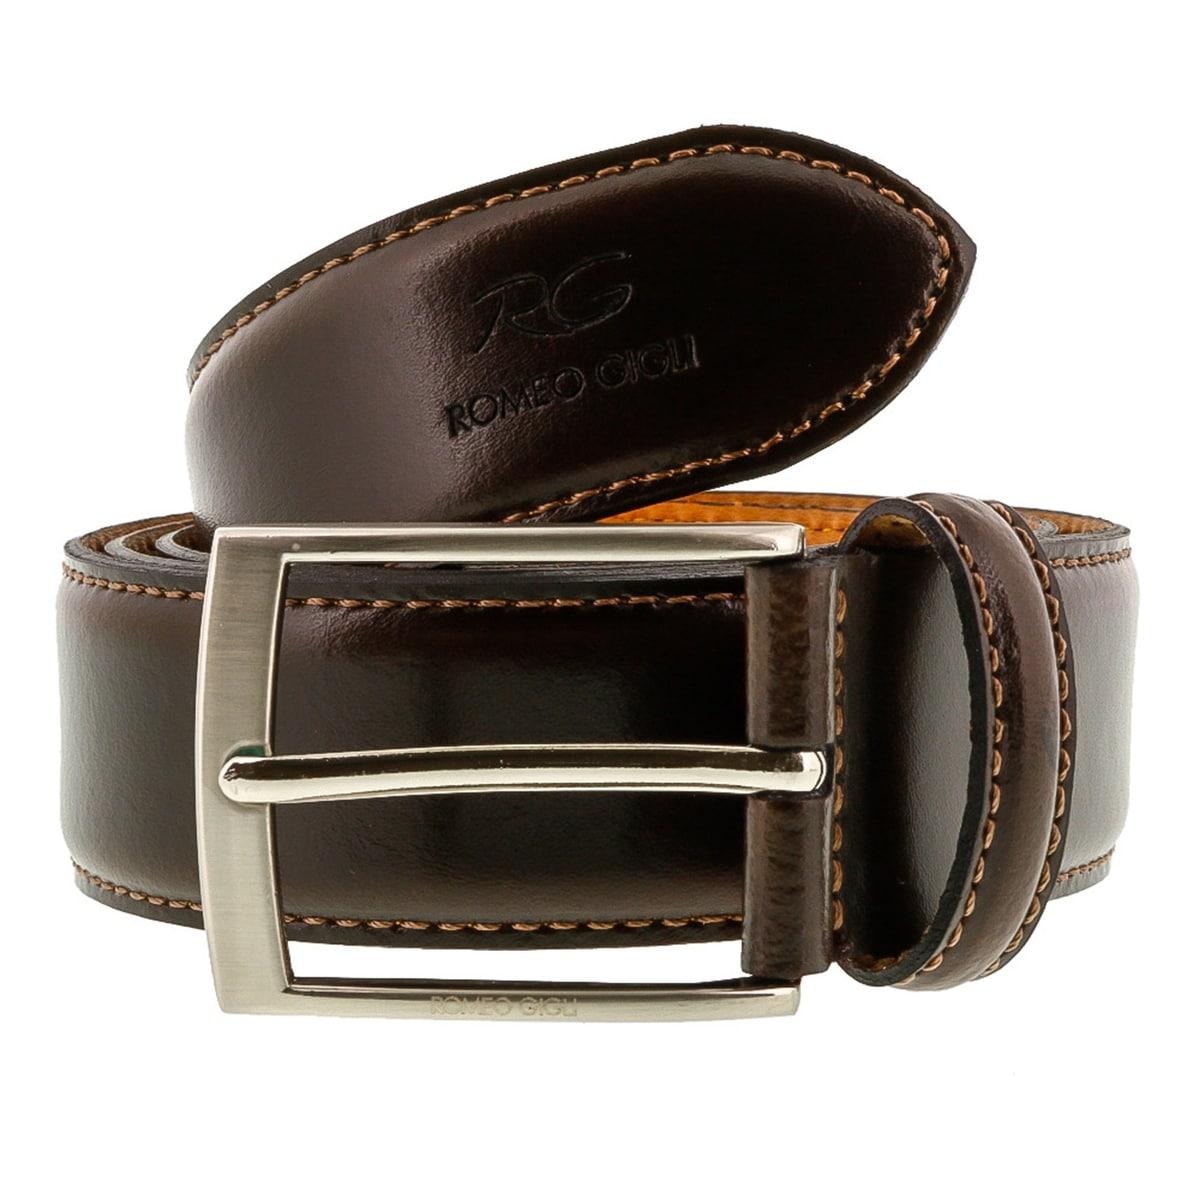 Romeo Gigli C955//35S T.MORO Dark Brown Leather Adjustable Mens Belt for mens